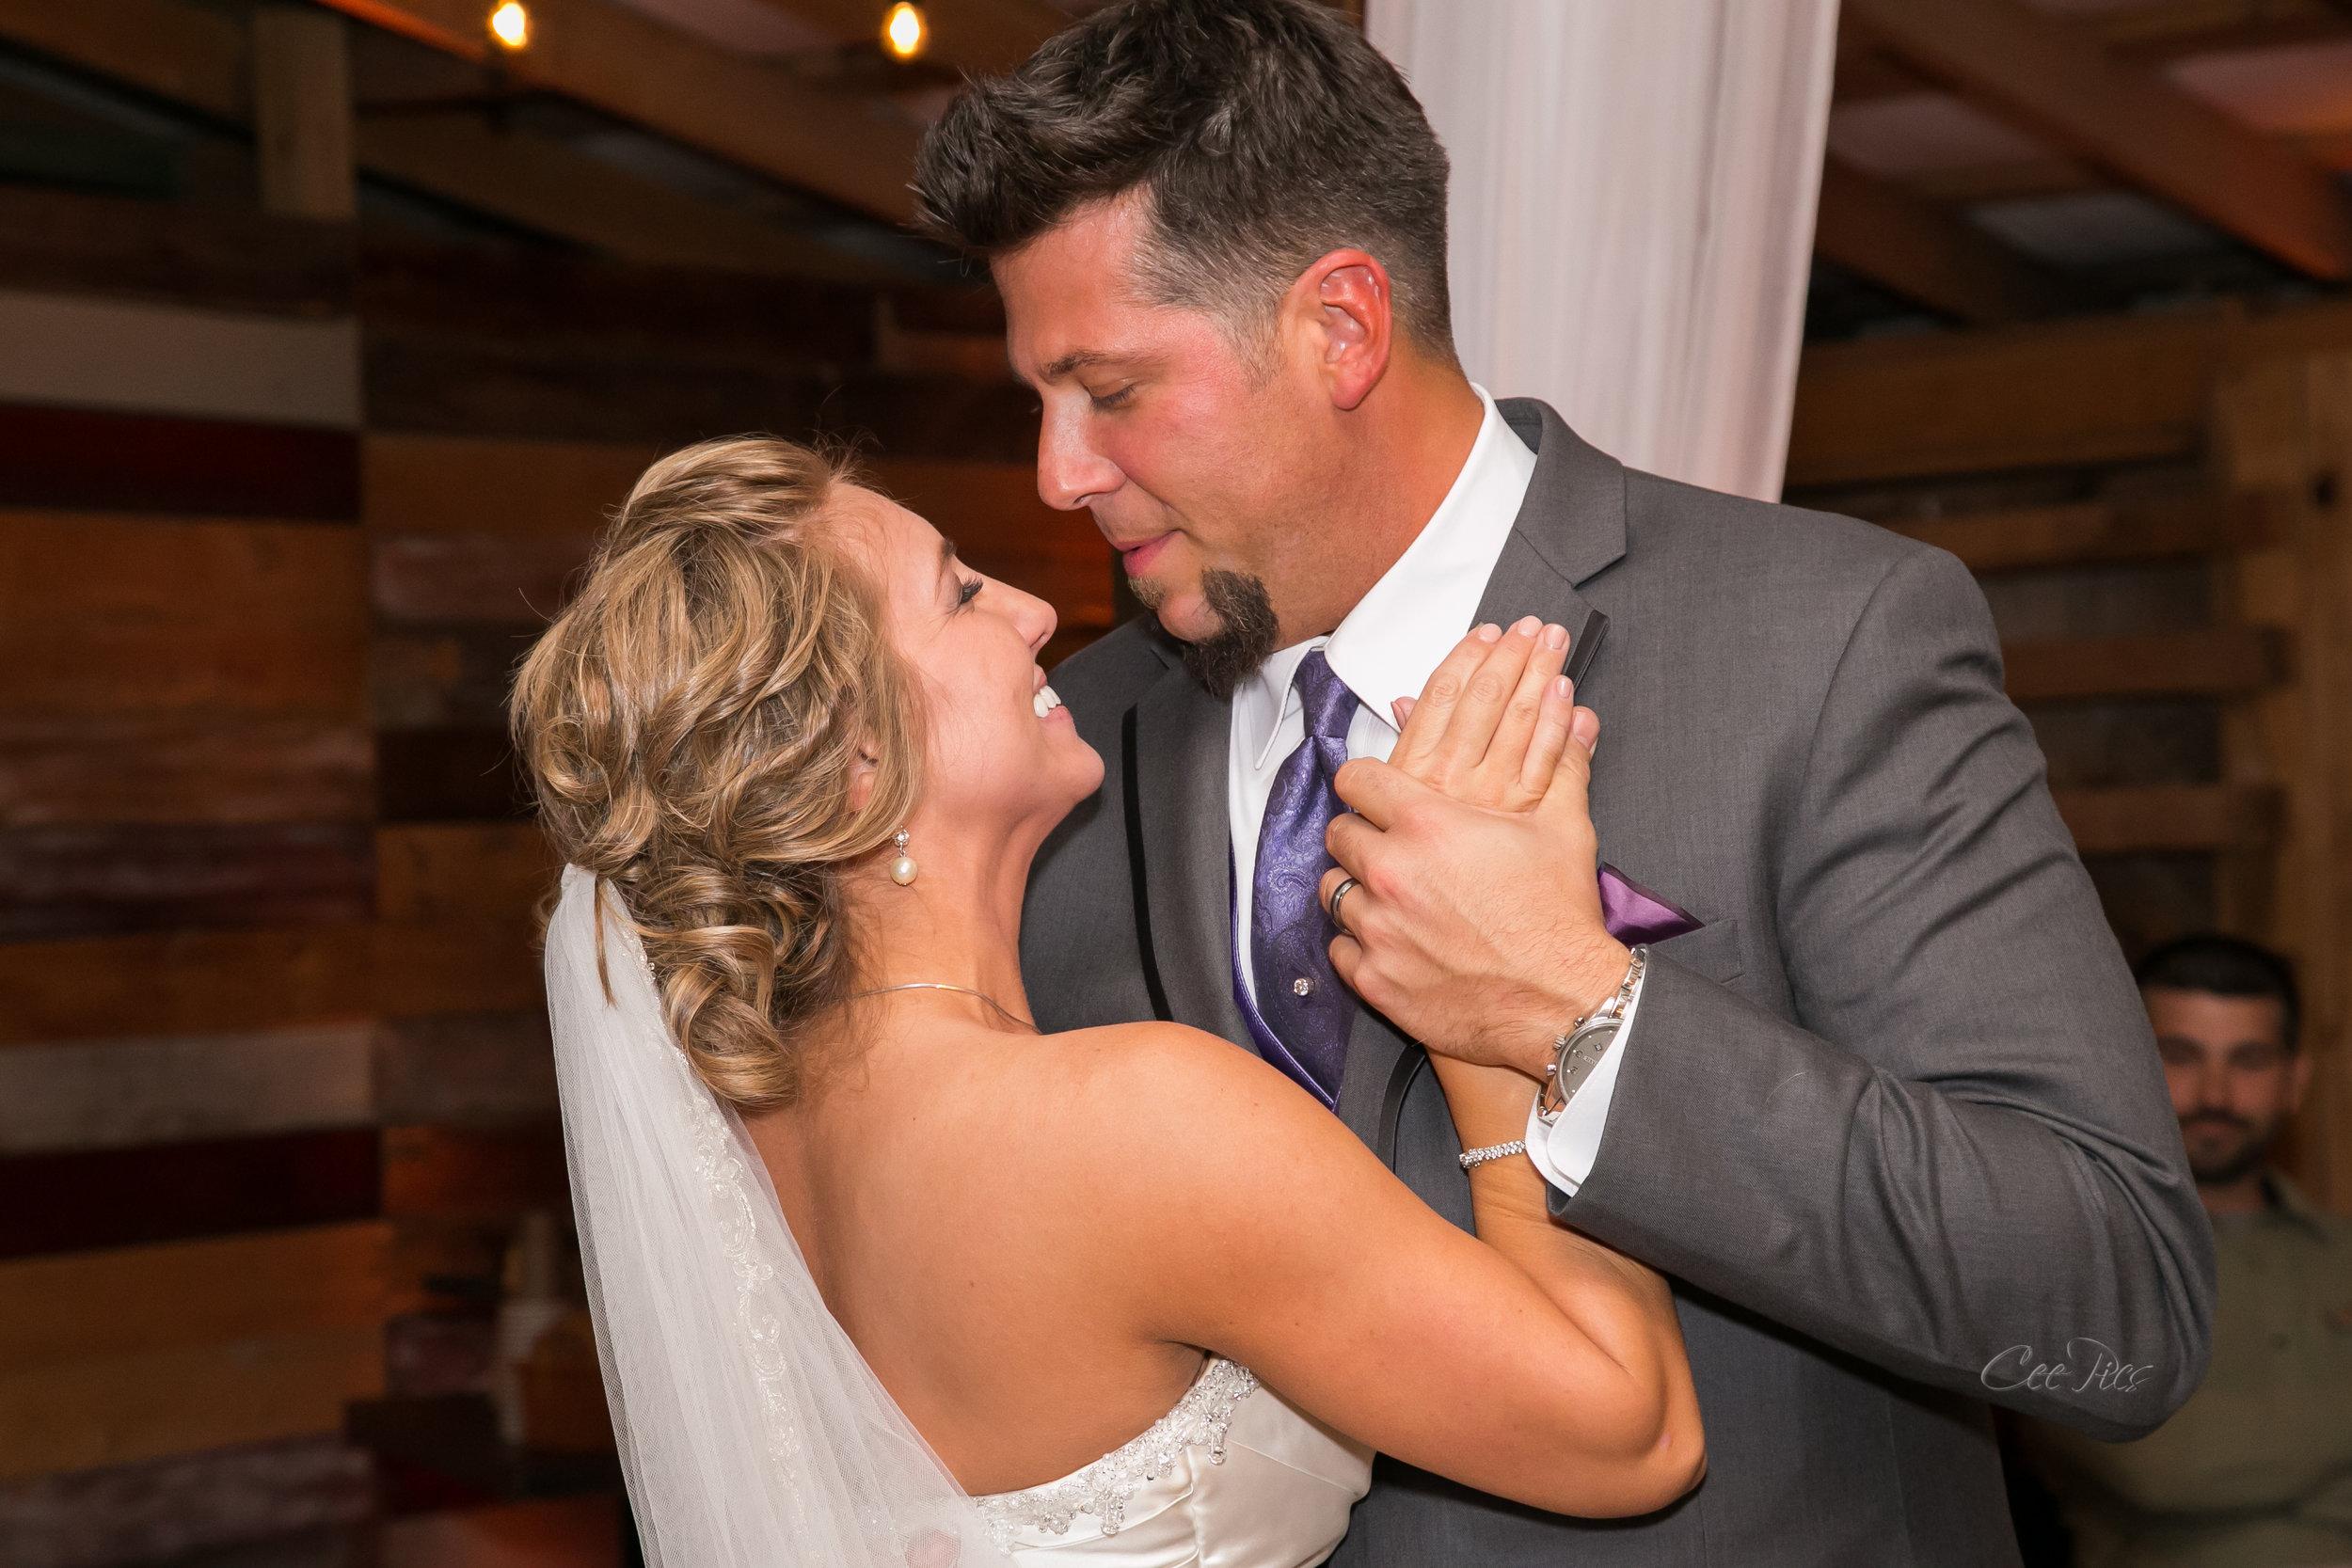 Nashville_Wedding_Photographer_Photography_DJ_MC_Lighting_Photobooth_Franklin_Bowling_Gallatin-123.jpg